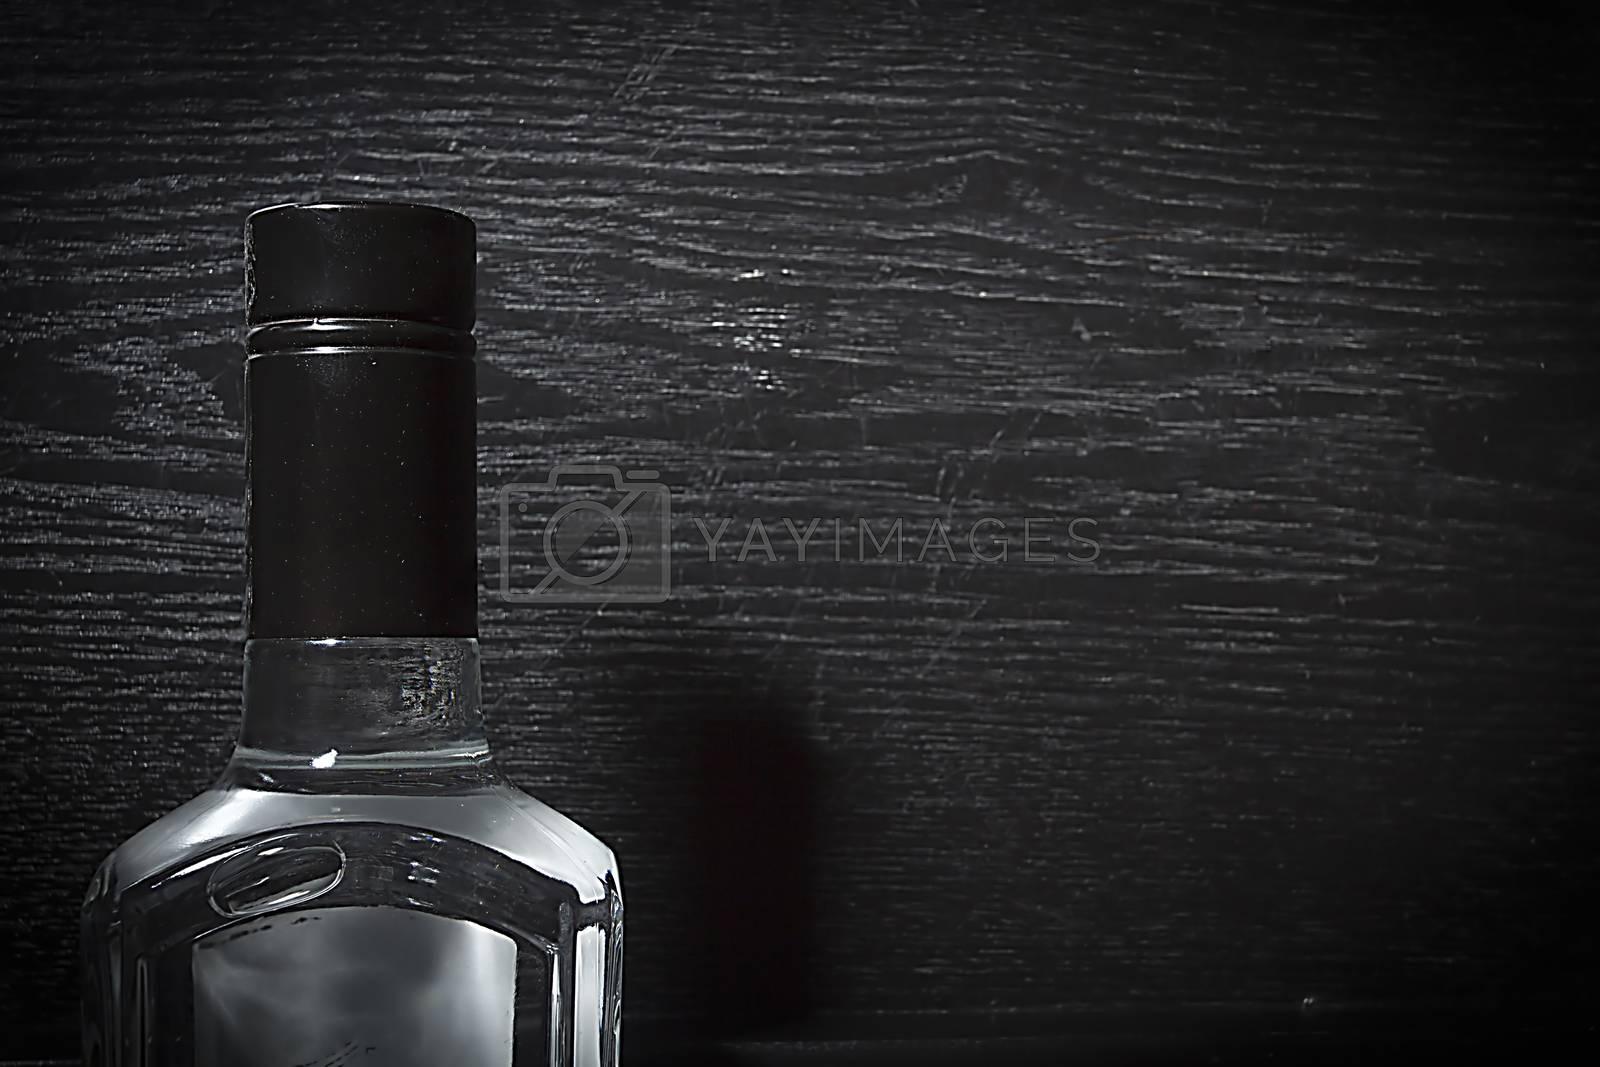 Neck of bottle with vodka on black wooden background